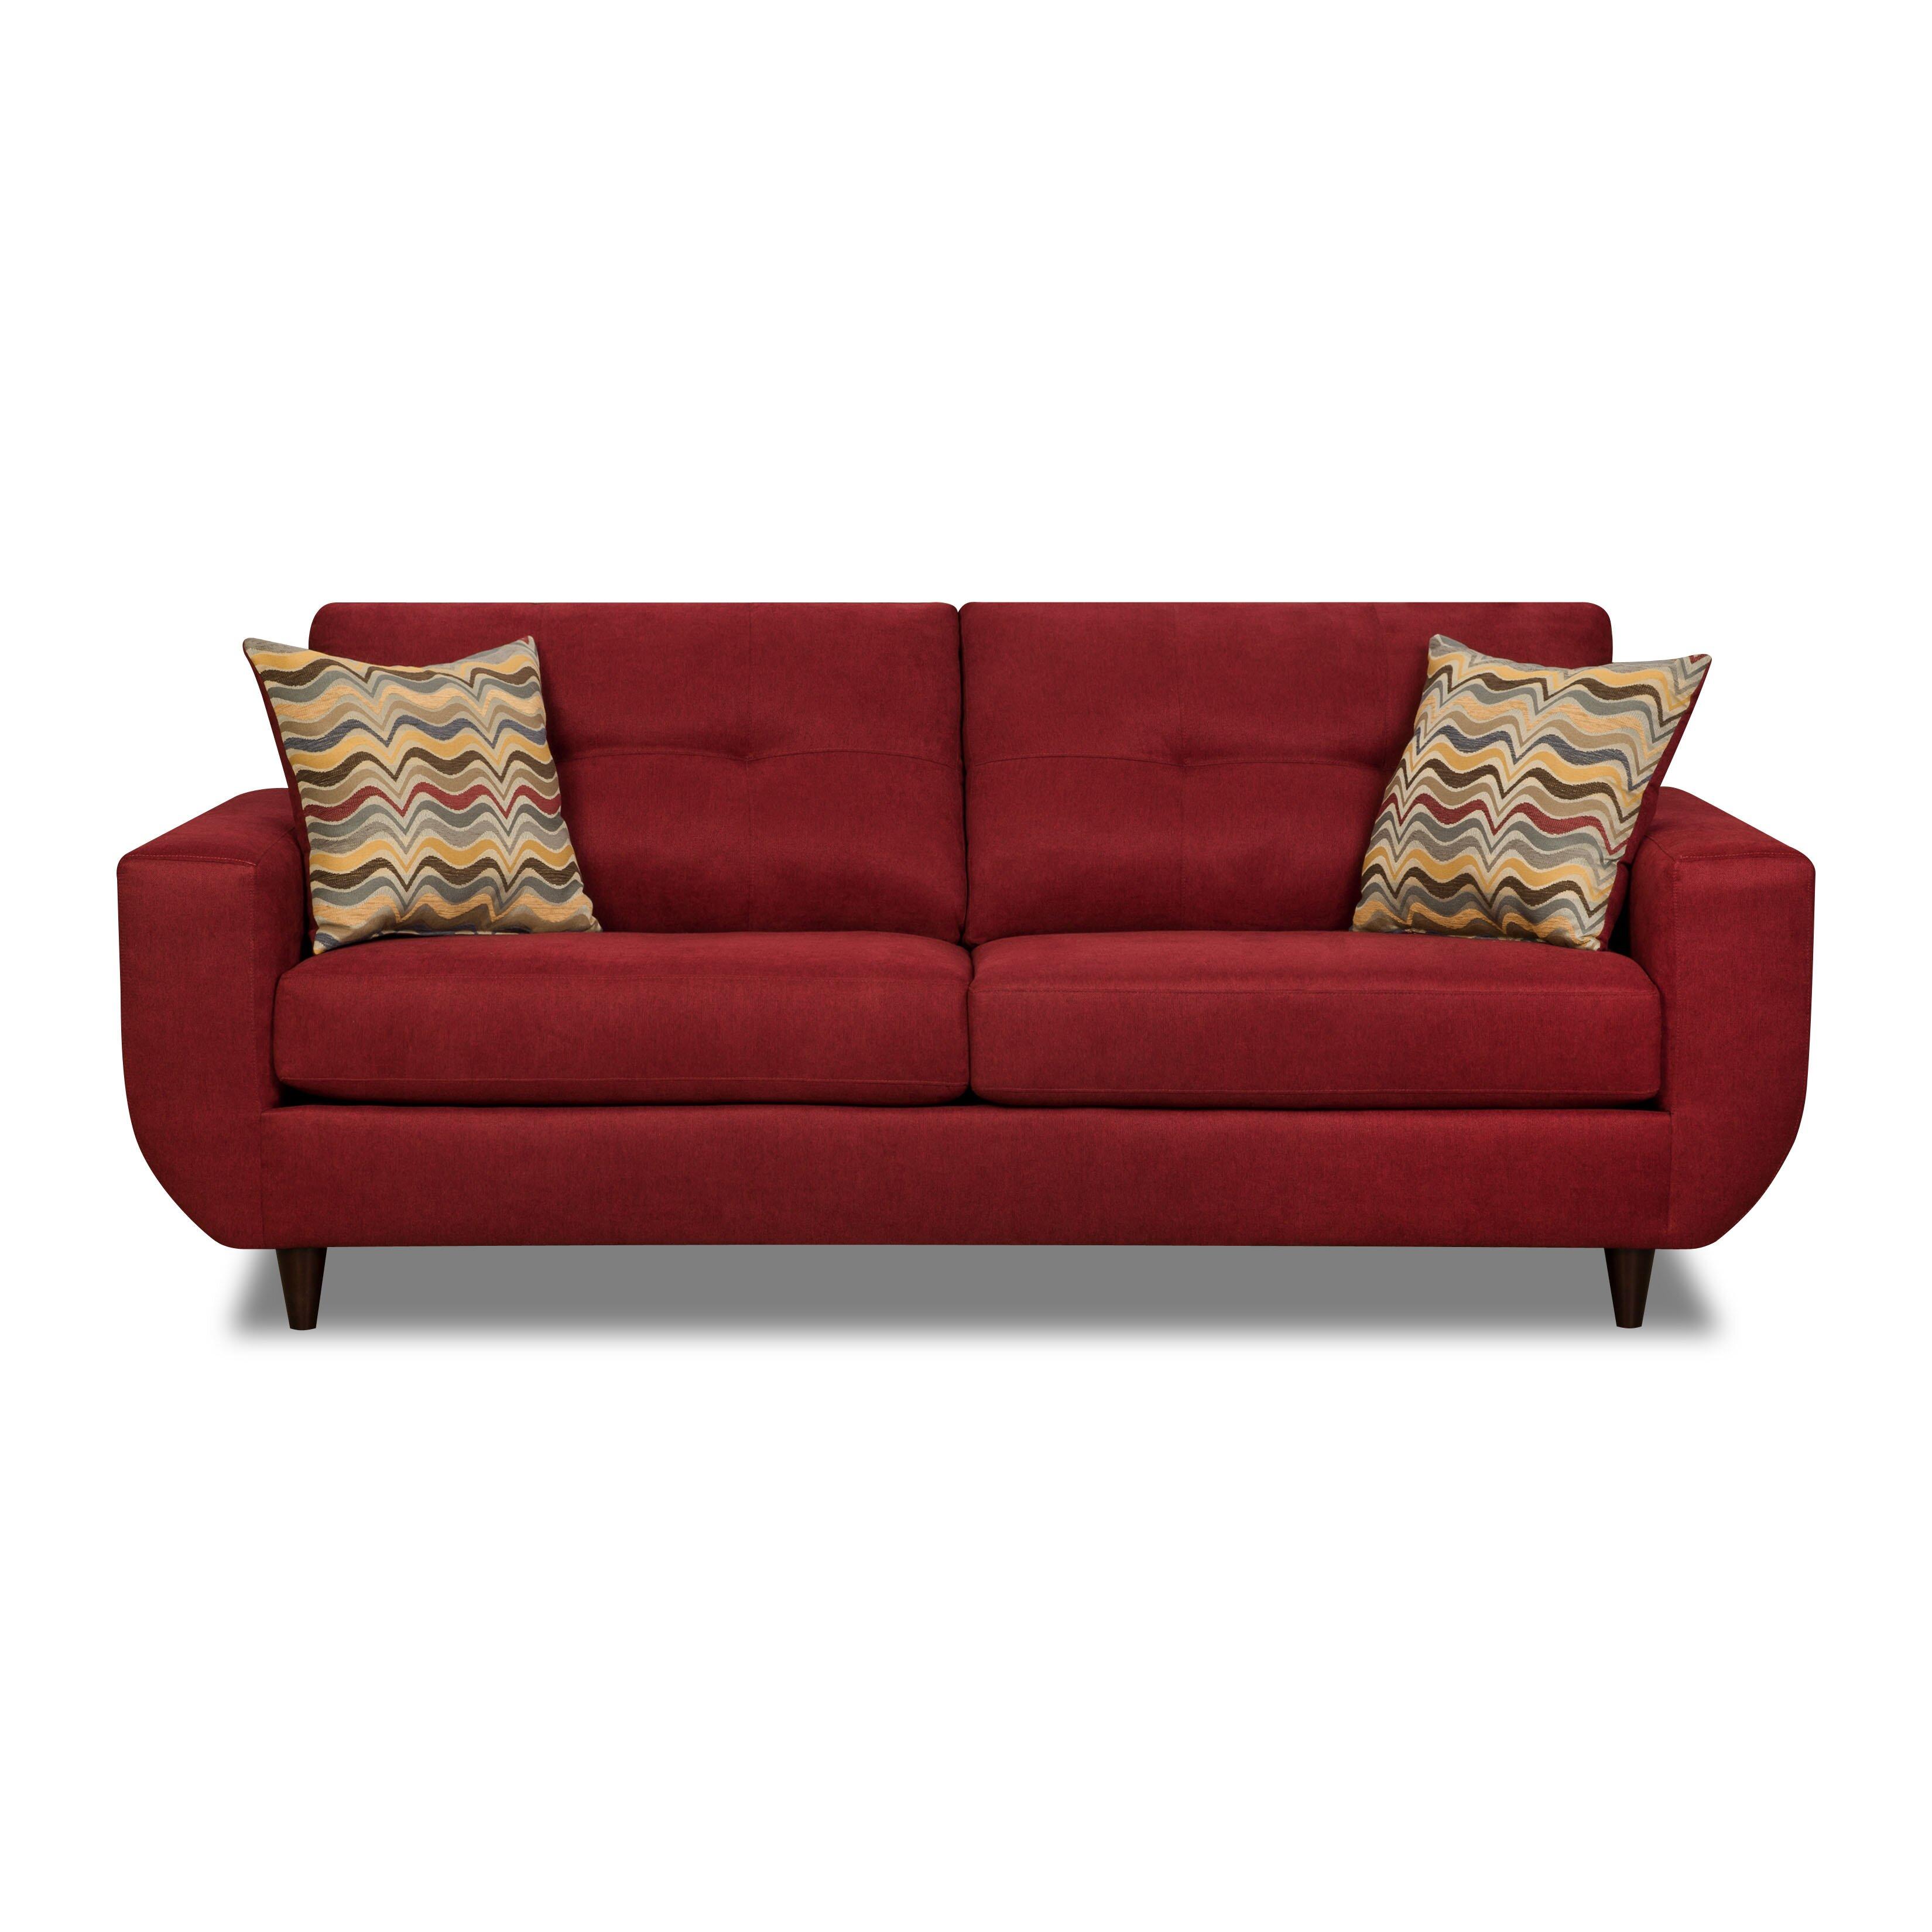 Simmons Upholstery Killington Sofa Reviews Wayfair